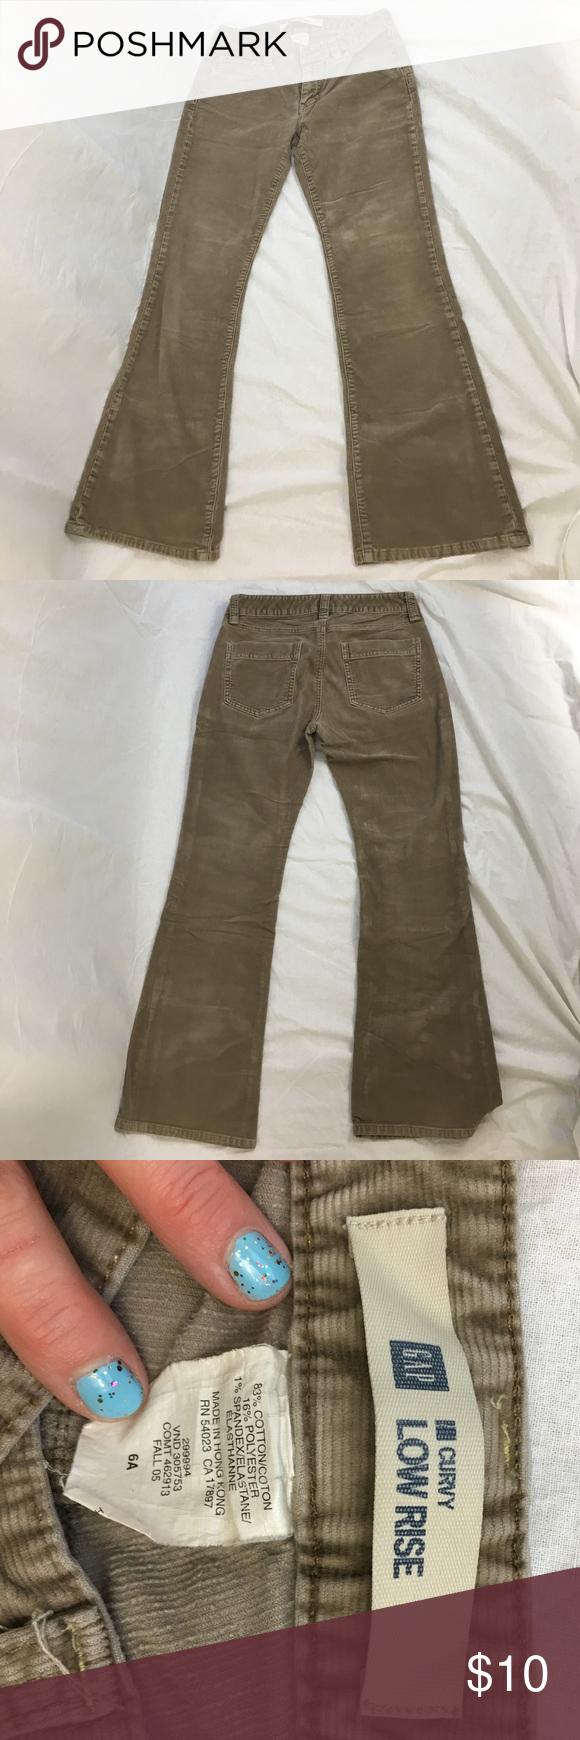 "Vintage 2005 Gap Size 6 Corduroy Pants Size 6 Ankle length 29"" Curvy Low Rise Cords in a nice neutral tan not khaki GAP Pants Ankle & Cropped"